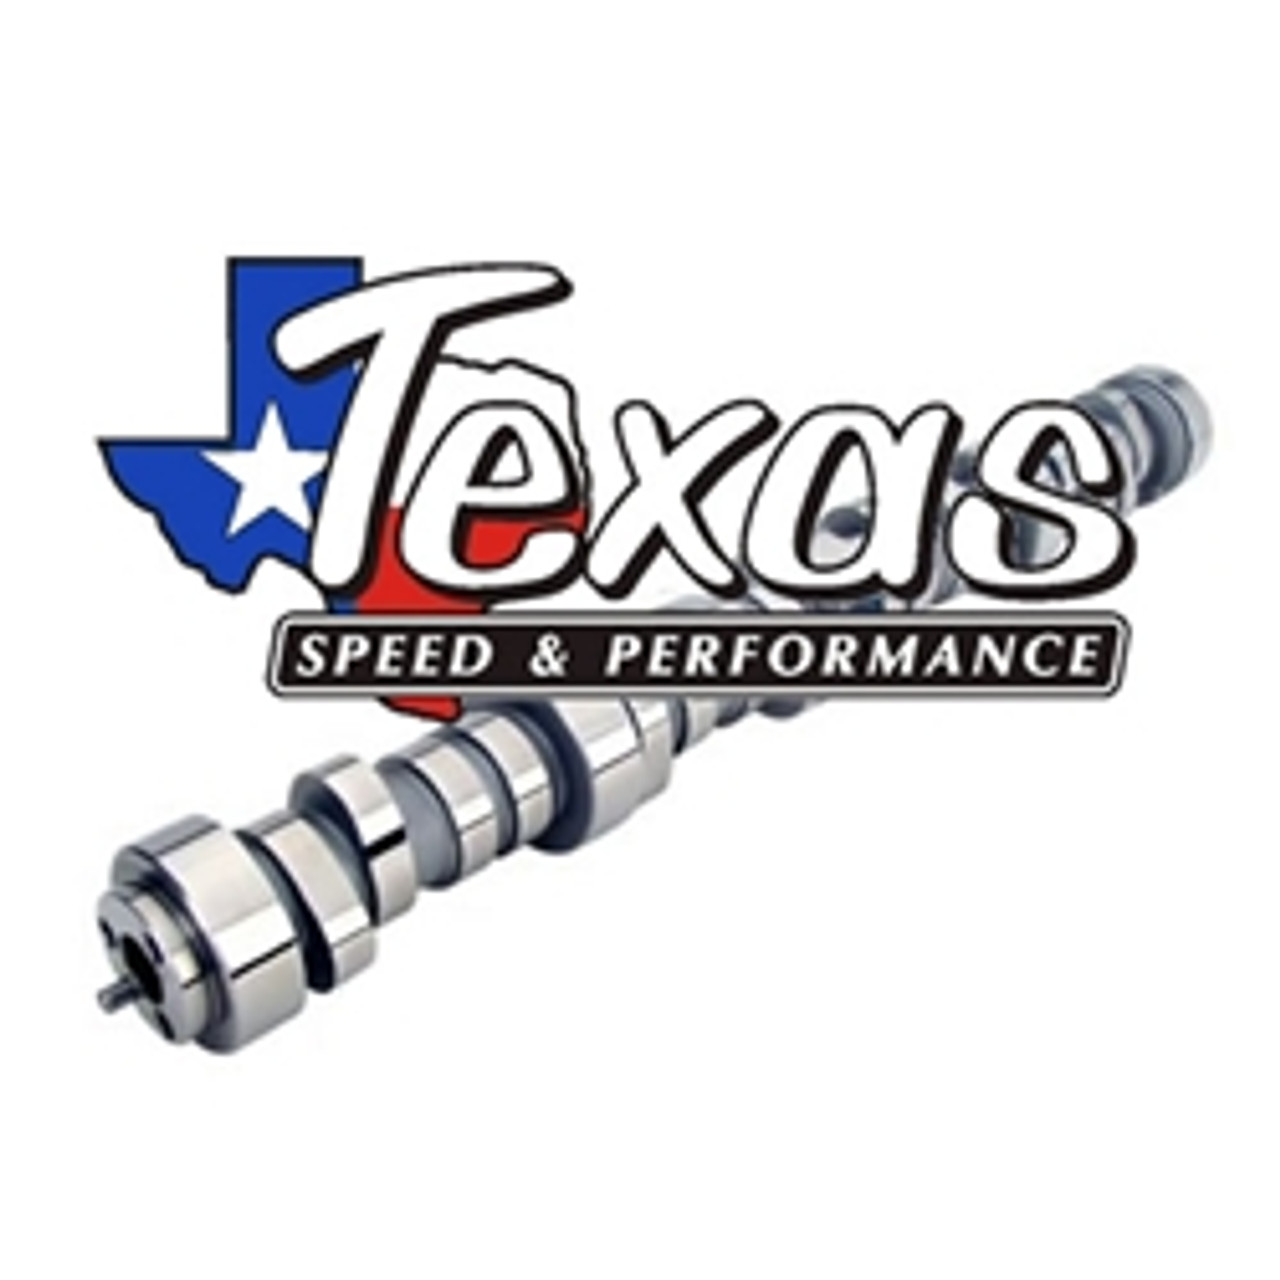 Texas Speed LS3 Turbo Stage 1 Camshaft